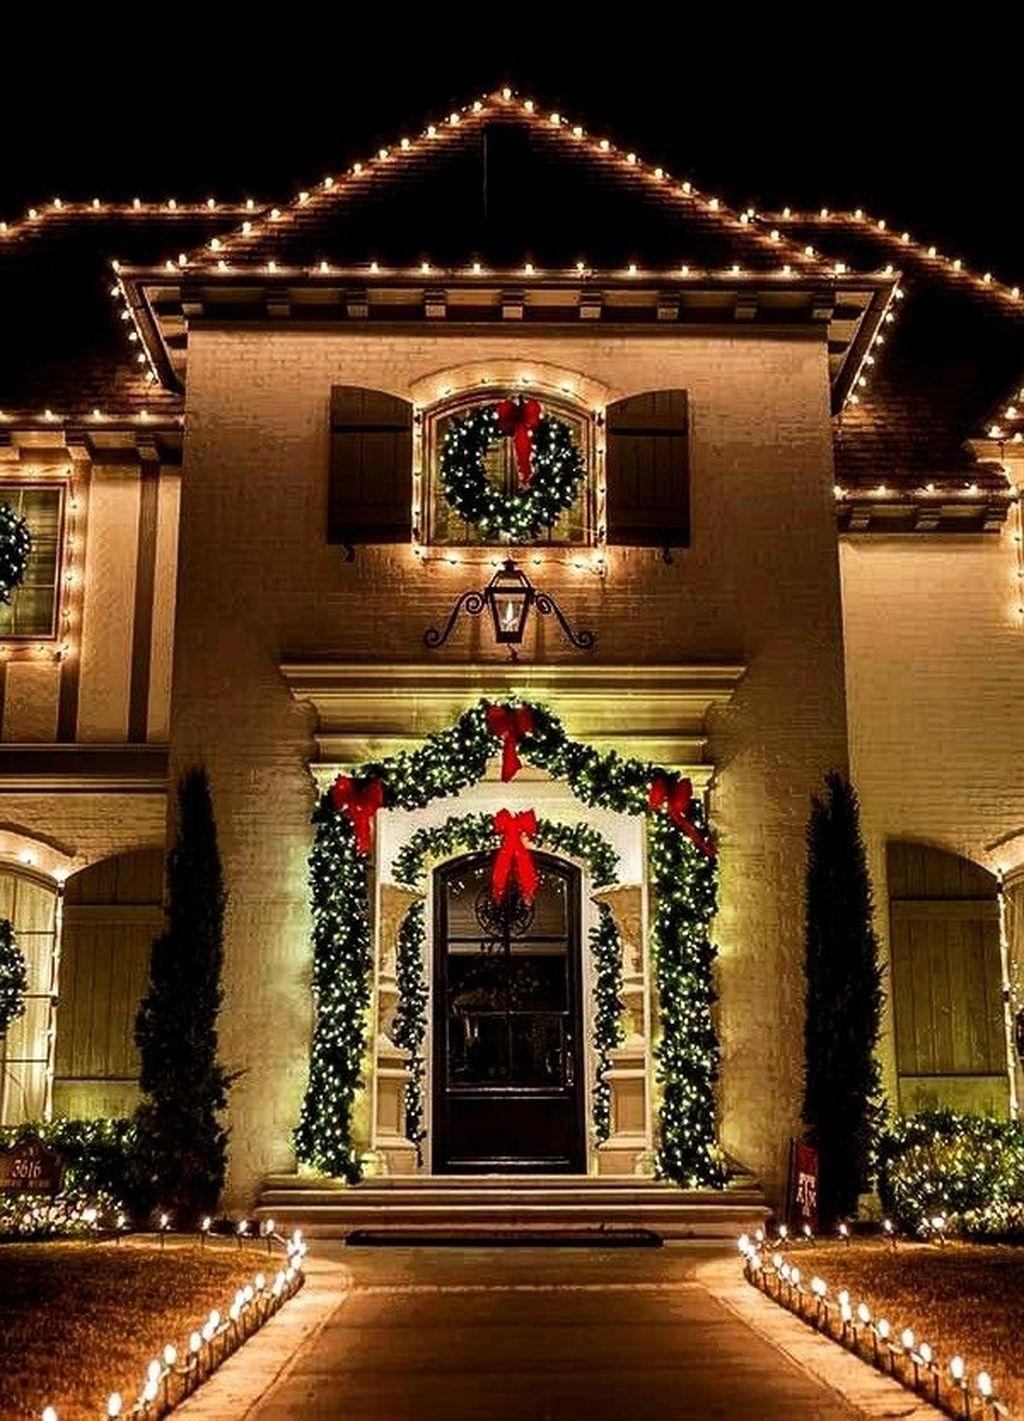 35 Stunning Christmas Lights Decor Ideas On House Exterior Decorating With Christmas Lights Exterior Christmas Lights Christmas House Lights